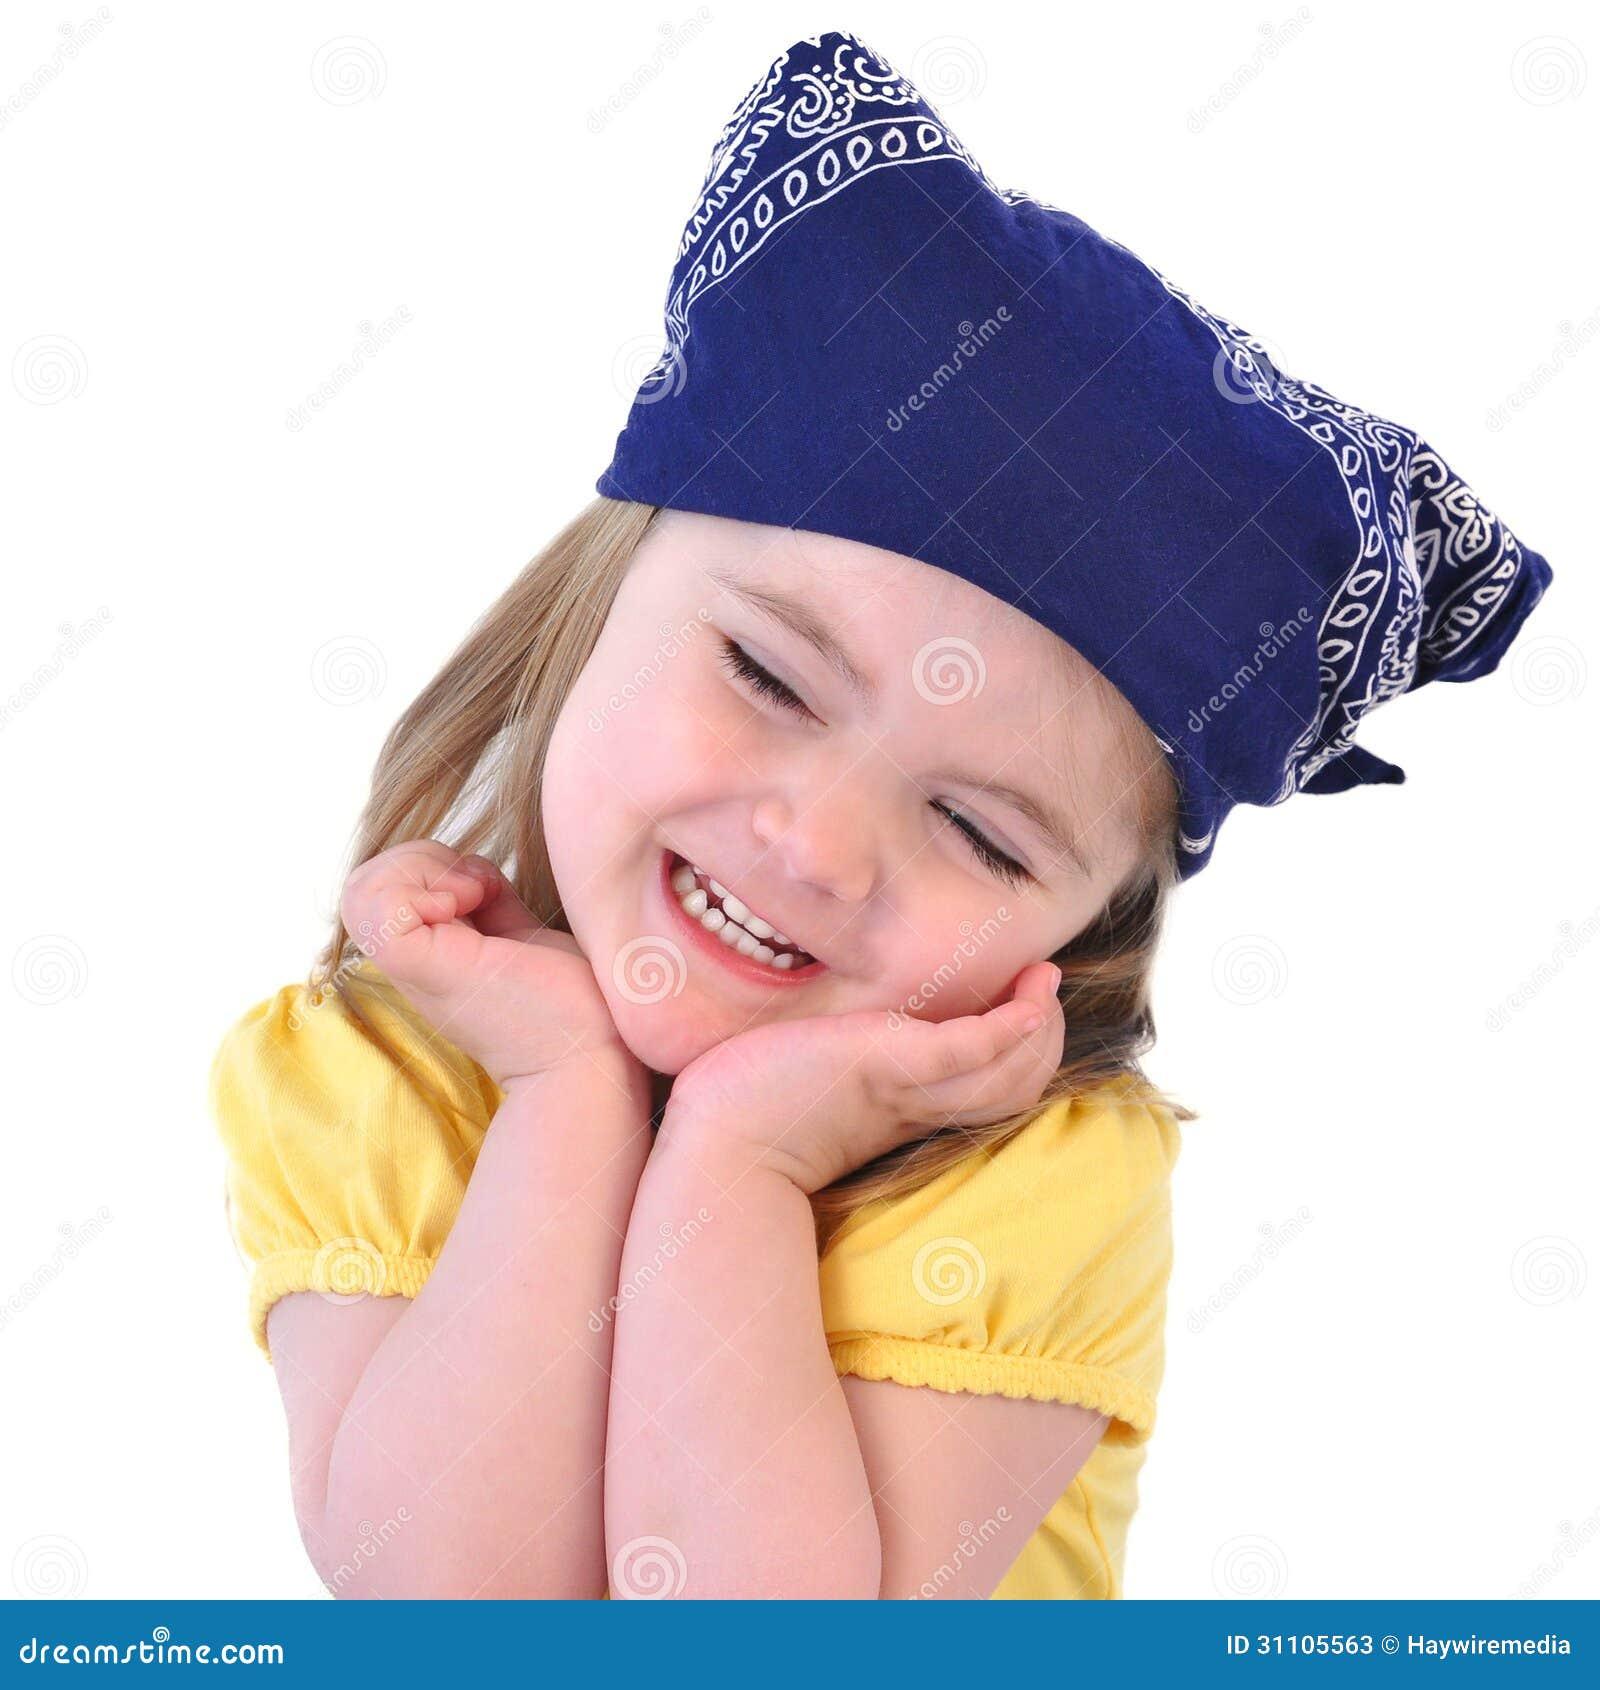 Бандана для ребёнка на голову своими руками